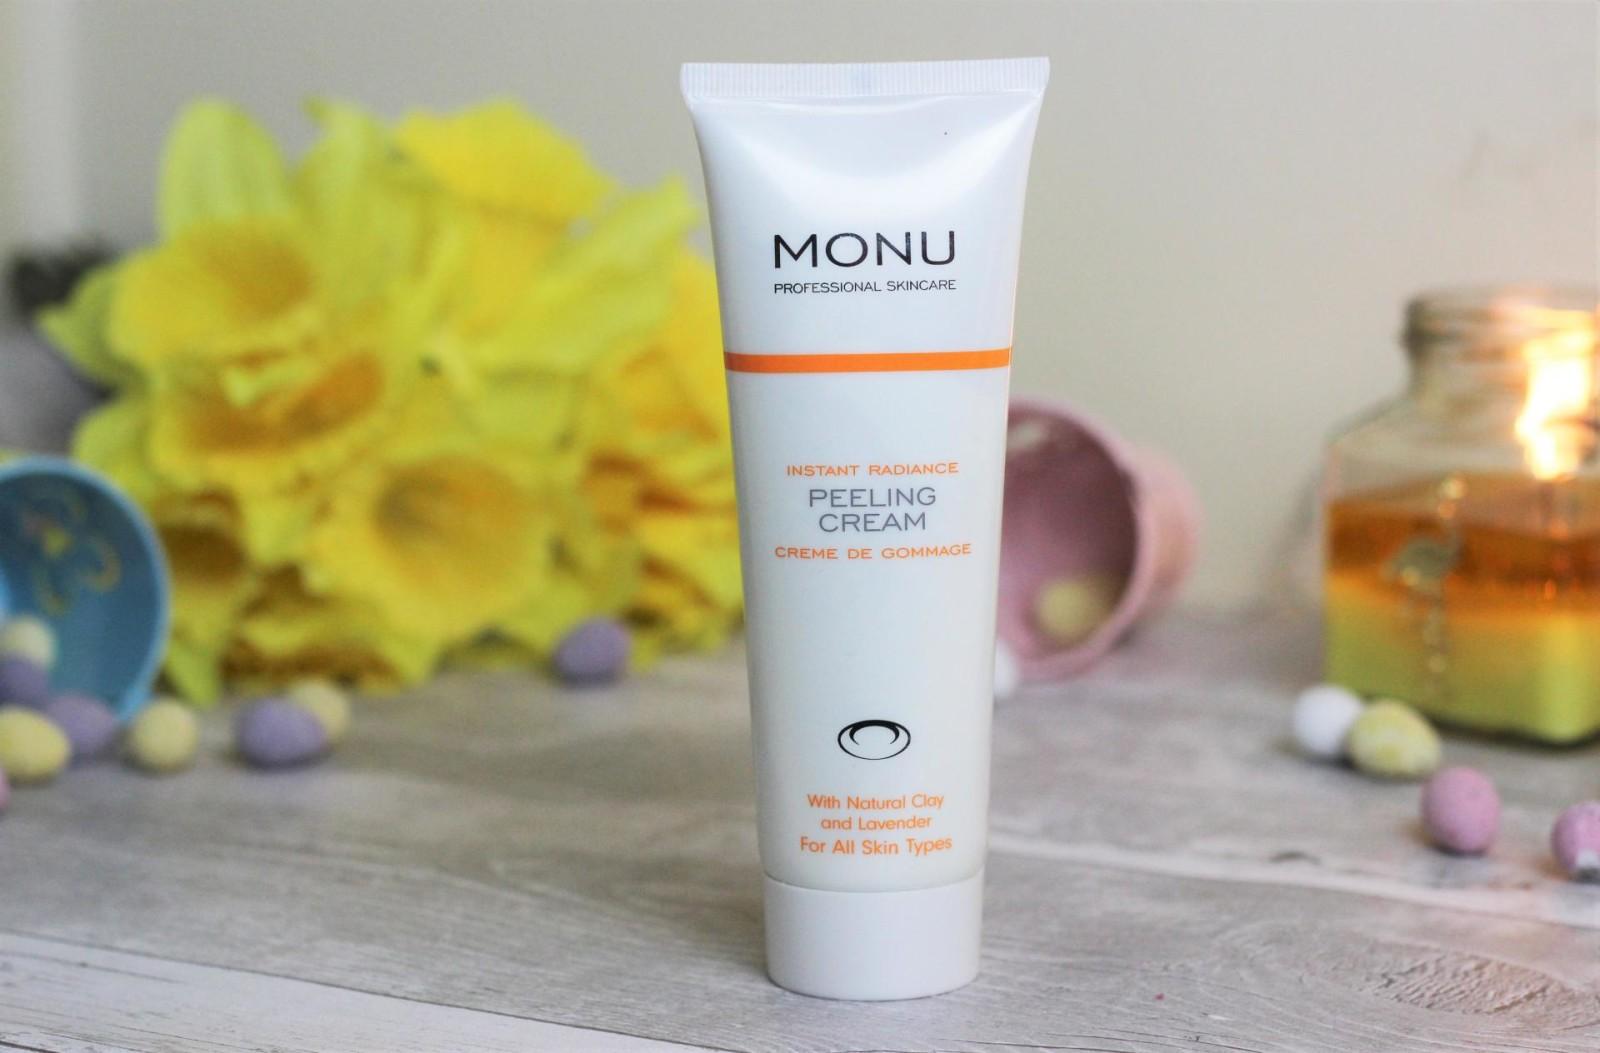 MONU Instant Radiance Peeling Cream